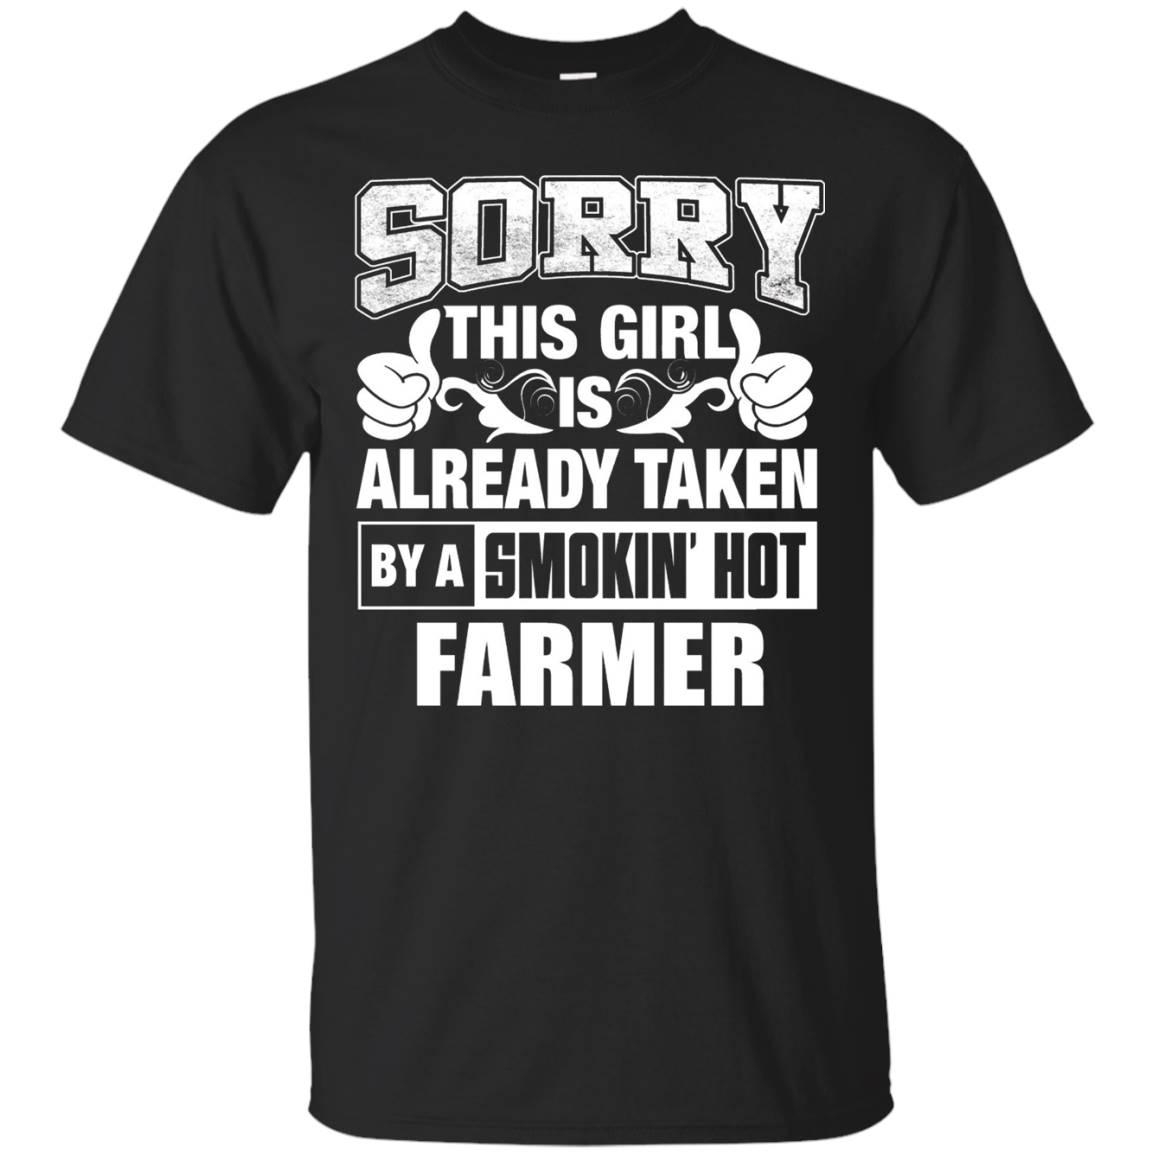 Farmer Shirt – Cool Shirt for Farmer Girlfriend, Wife